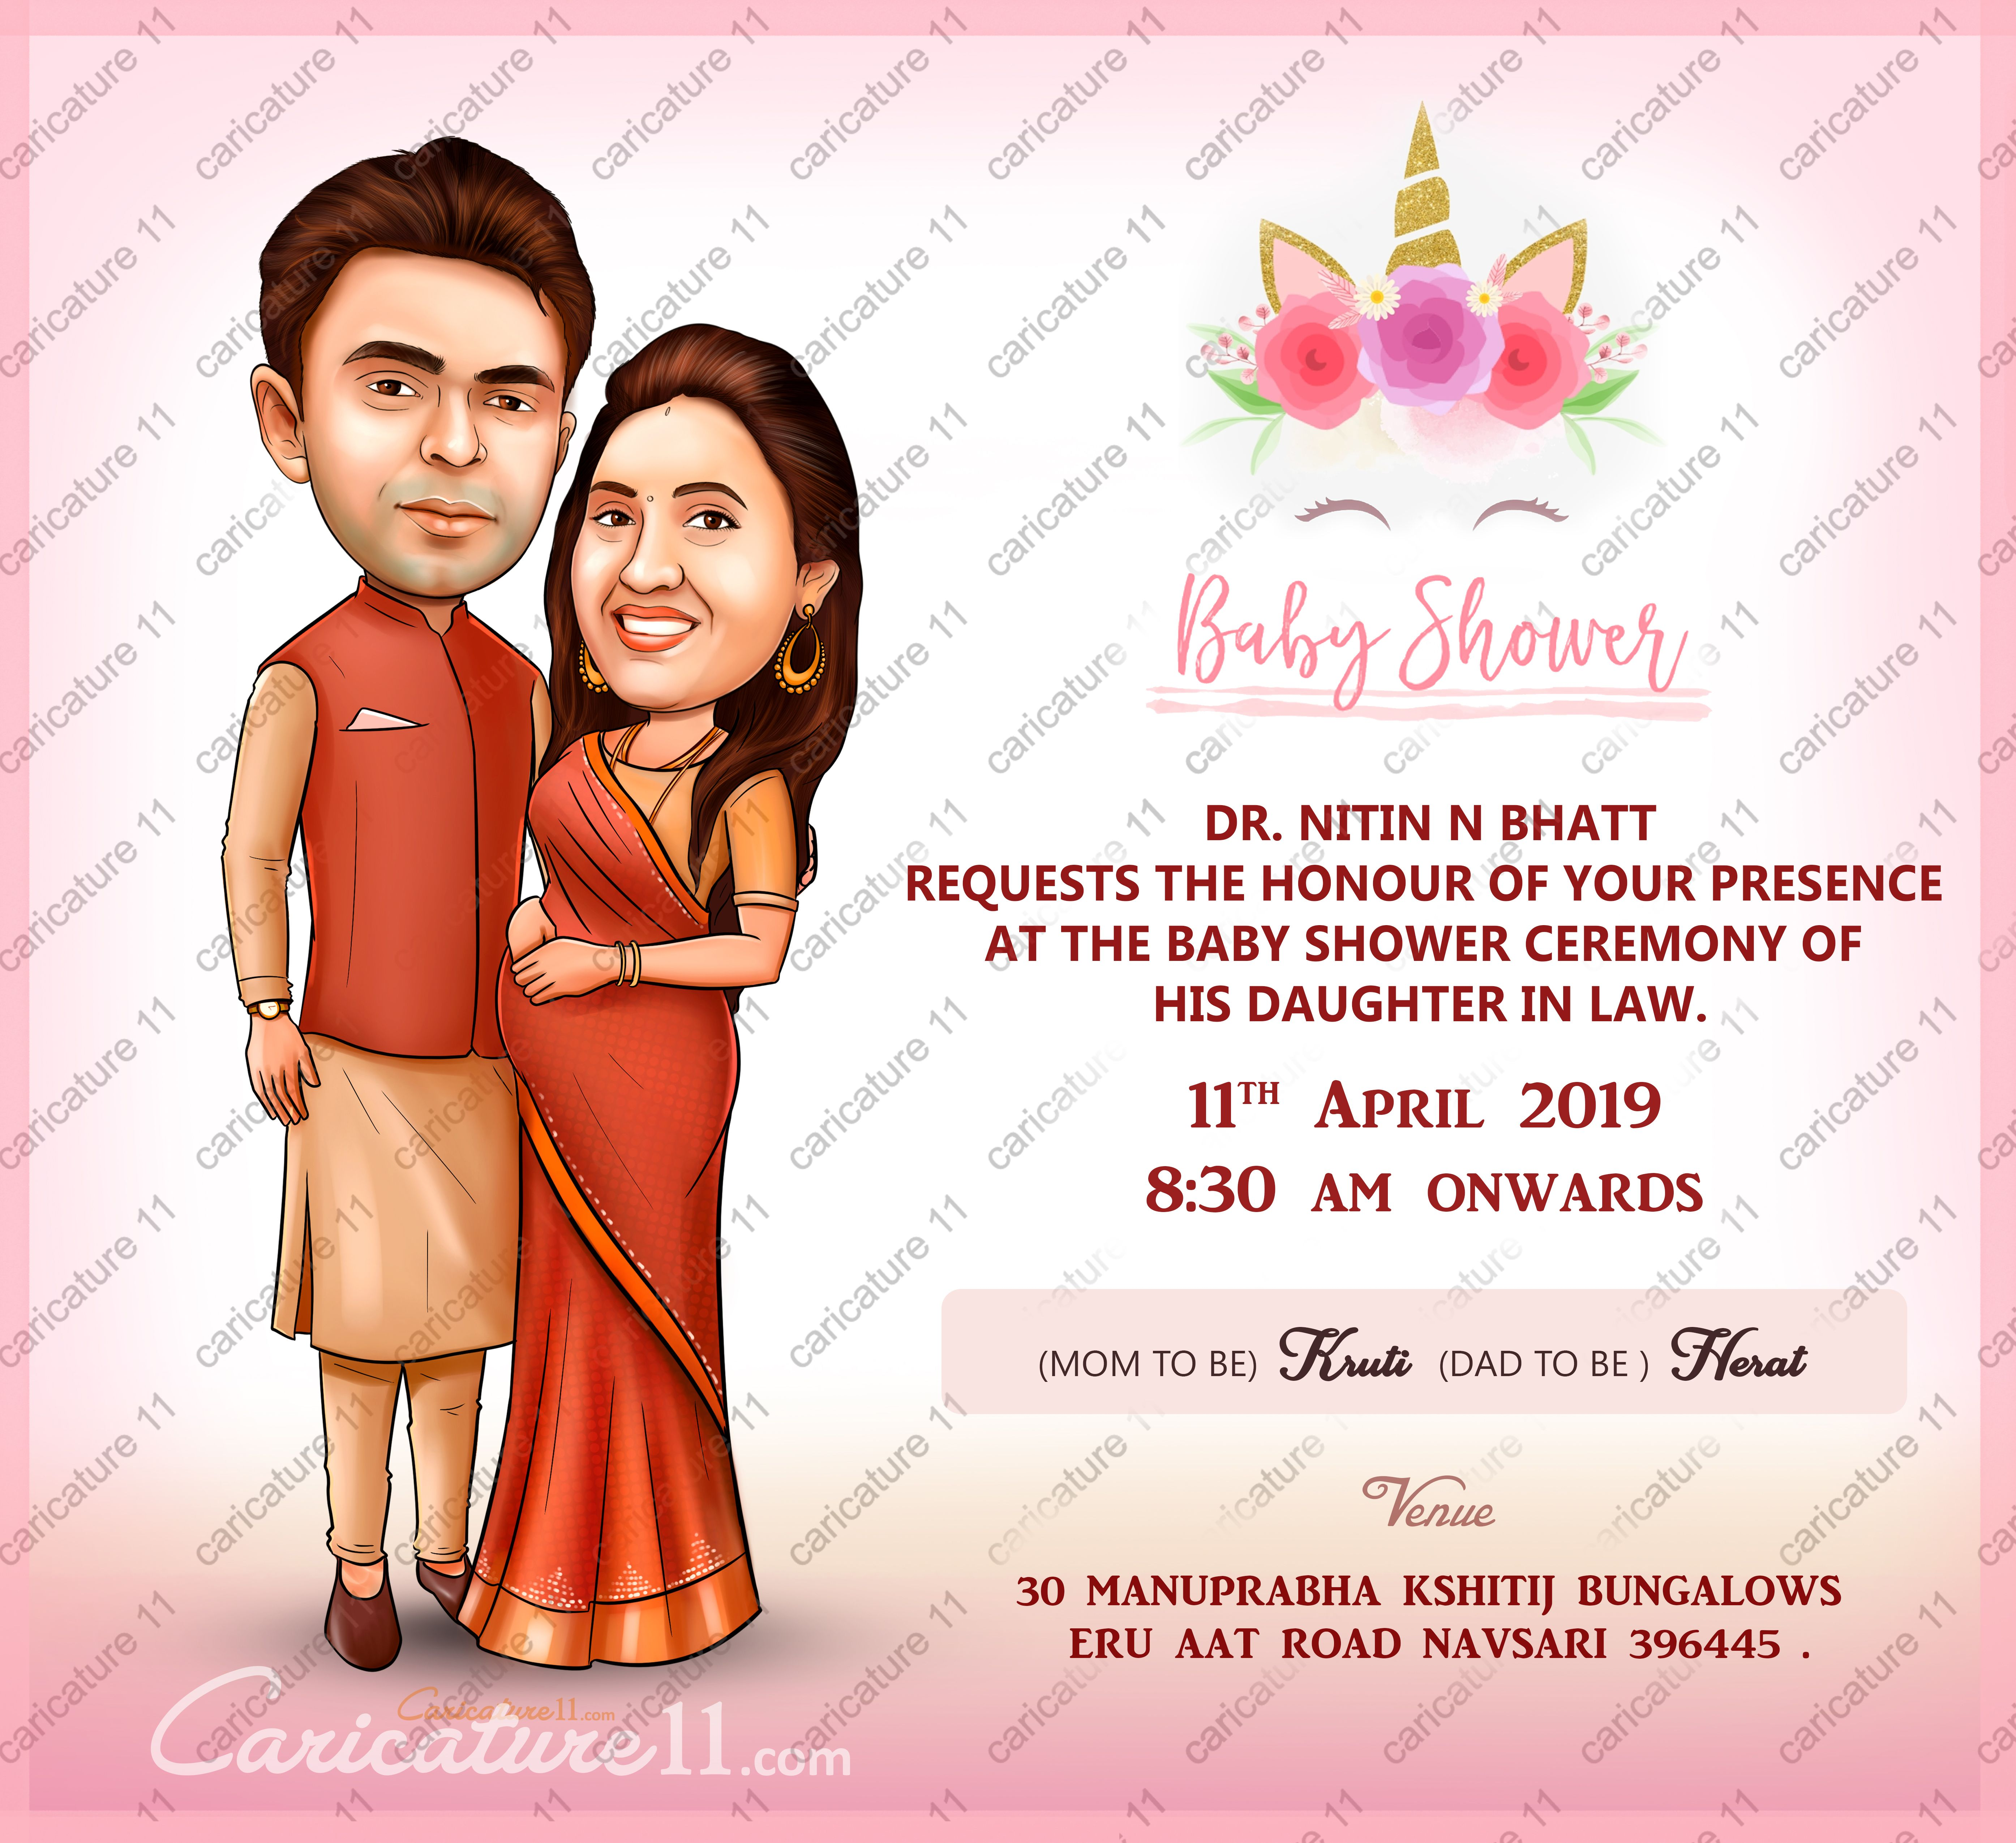 Baby Shower Invitation Card Design Couple Caricature